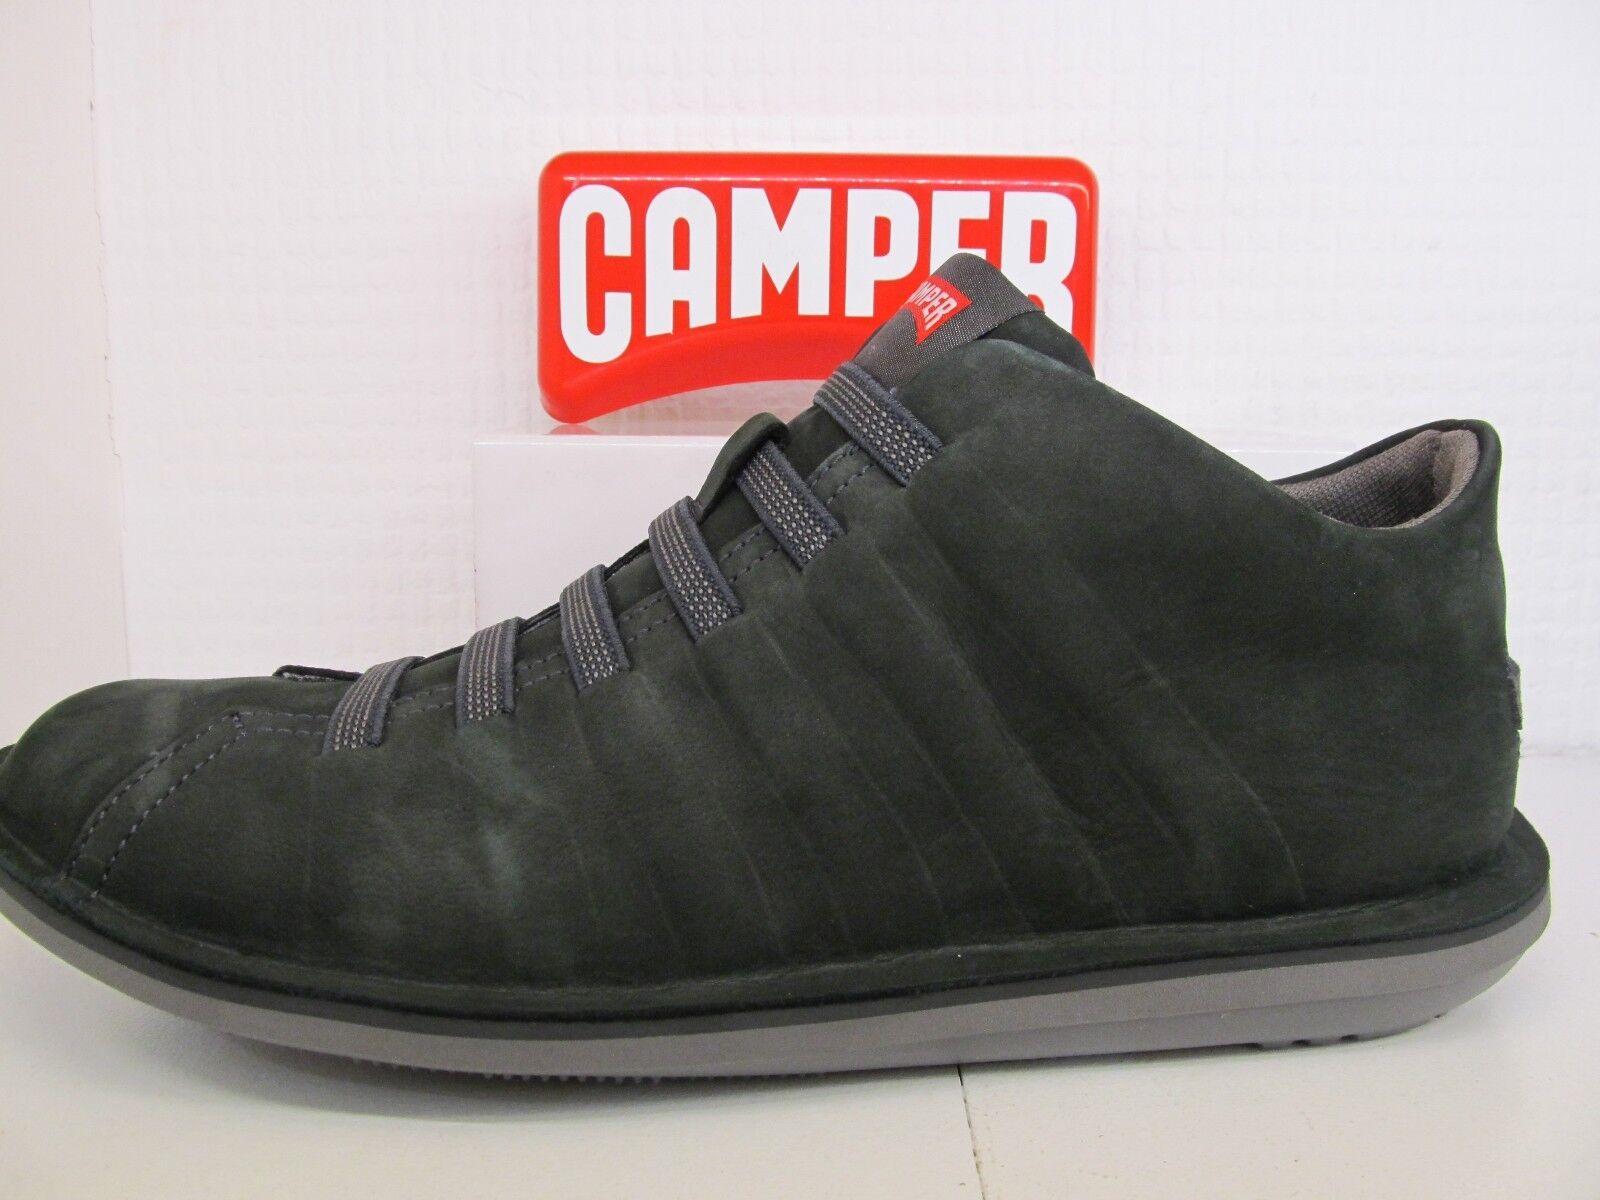 36678-057 Camper Beetle verde nabuk scuro in pelle di nabuk verde INS Scarpa in pizzo elastico 2dc865